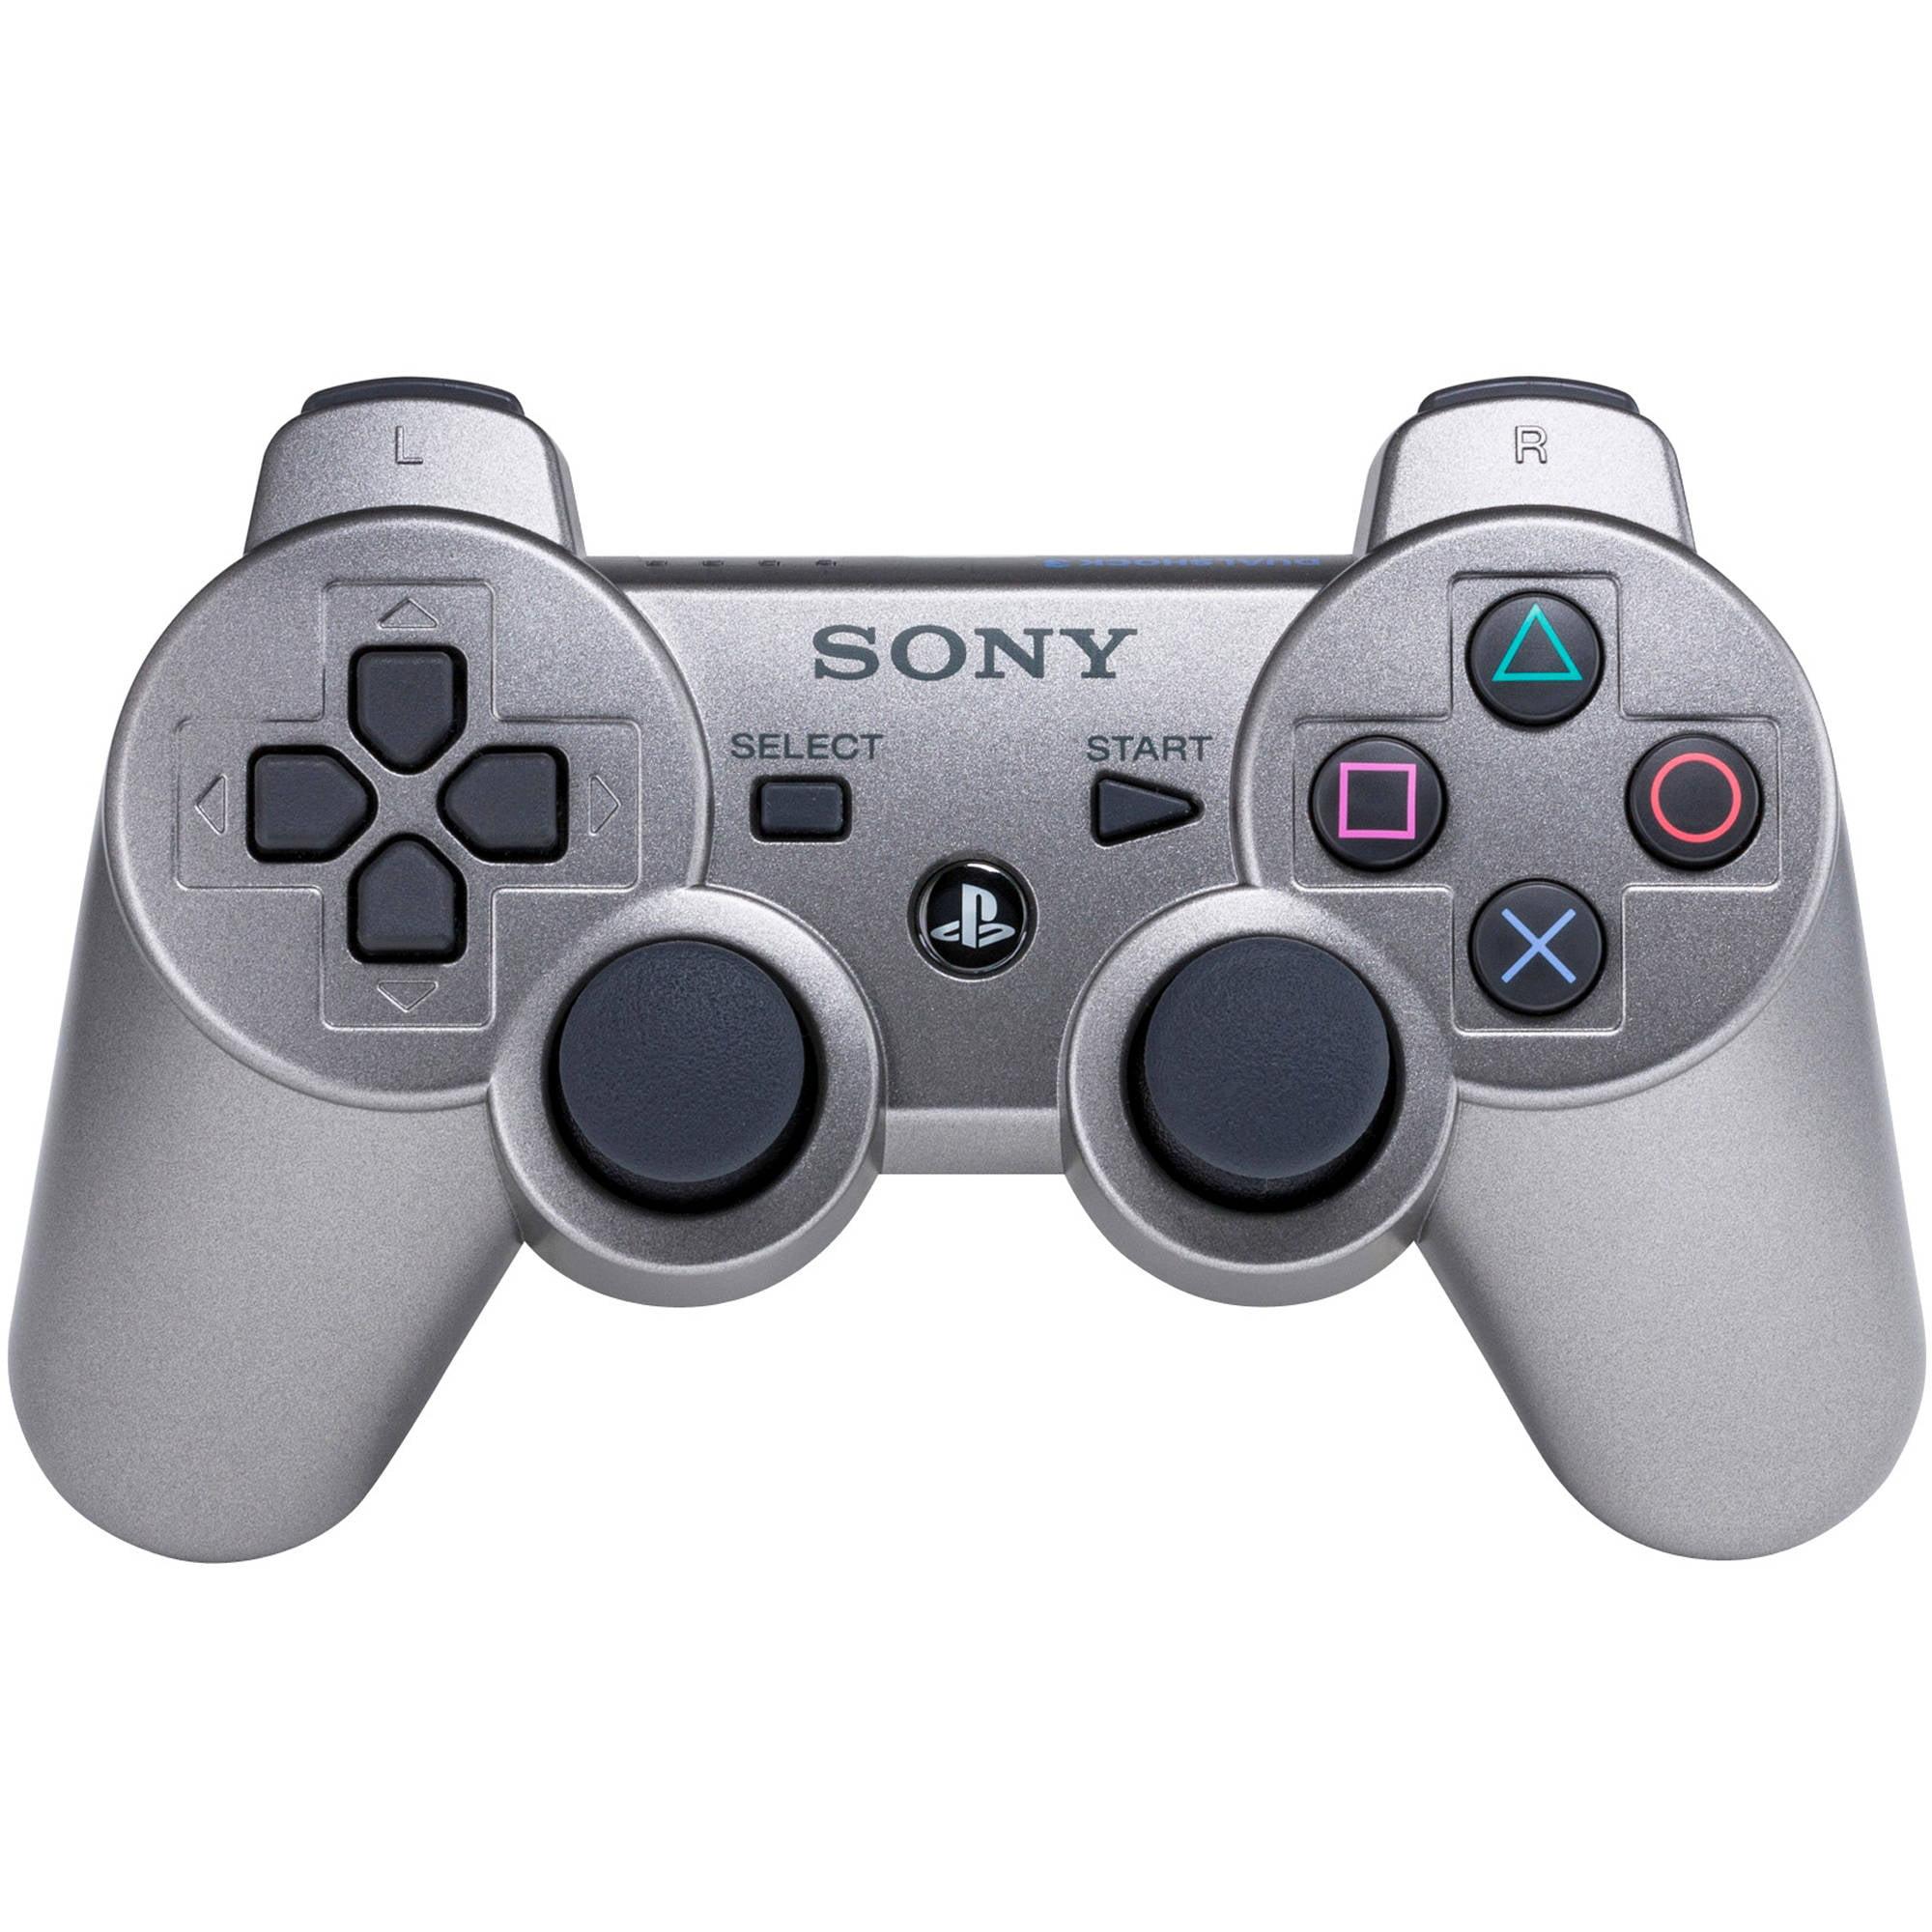 Sony Ps3 Dualshock3 Metallic Gray Controller